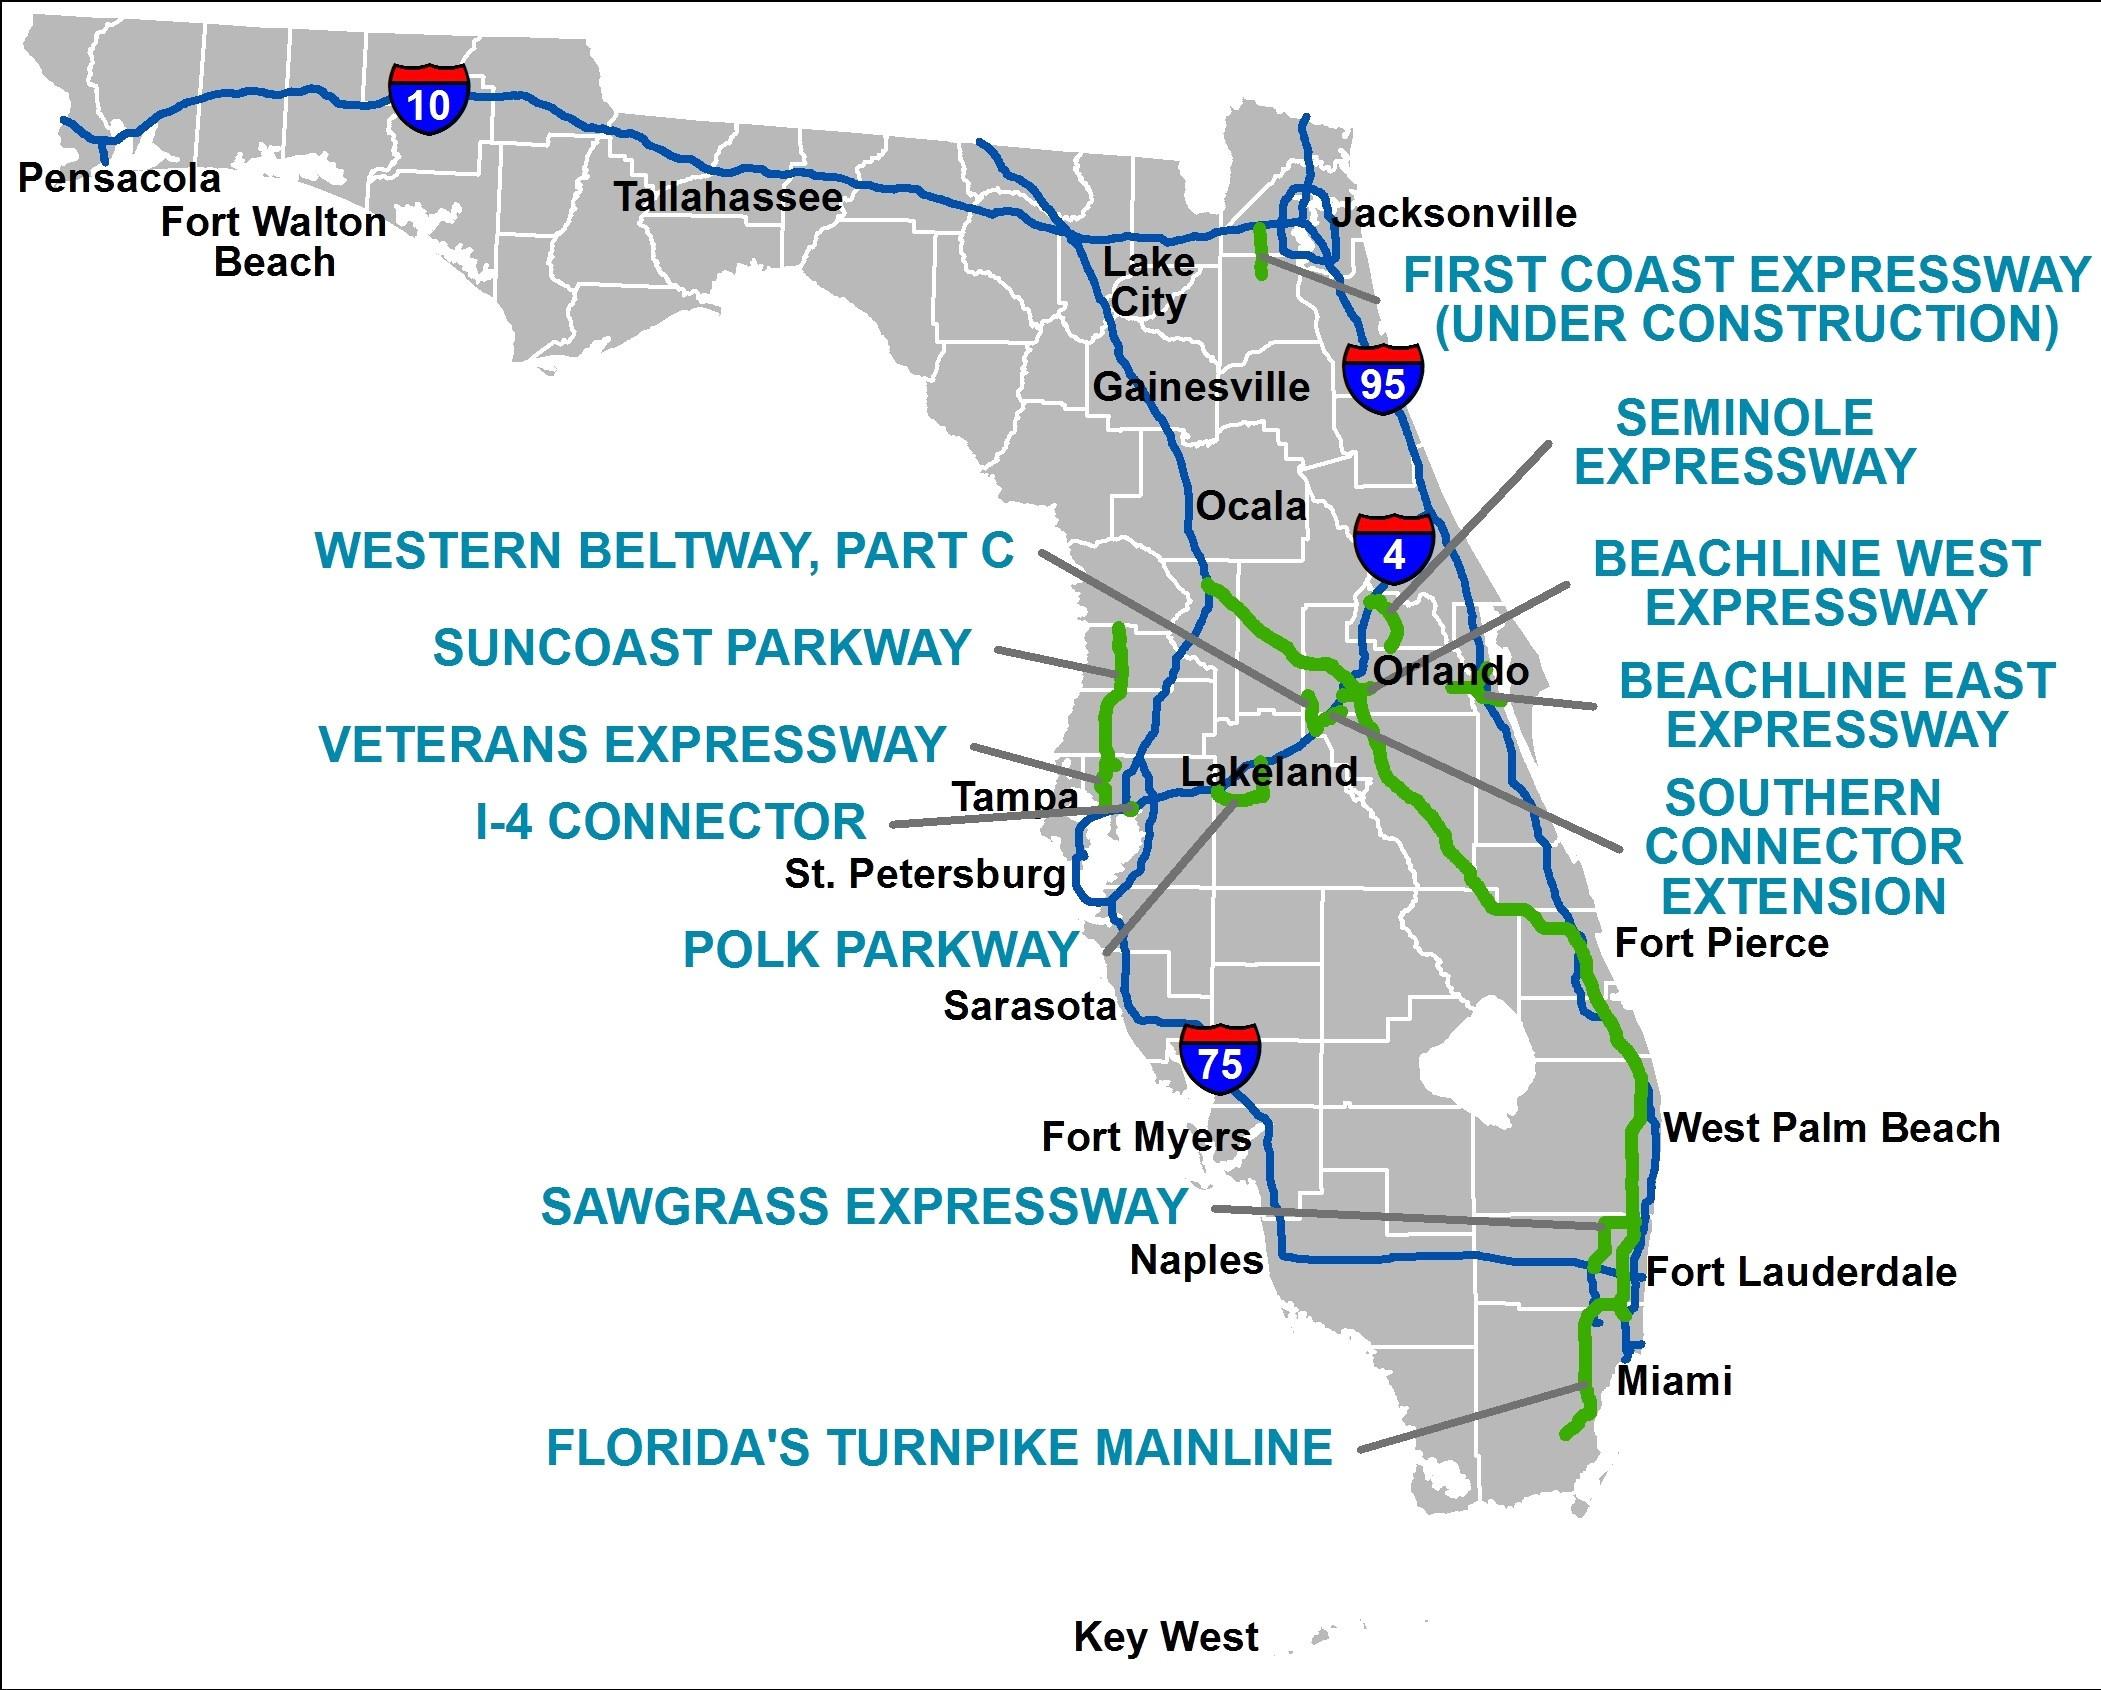 Gulf Coast Cities In Florida Map Florida Panhandle Cities Map - Gulf Coast Cities In Florida Map